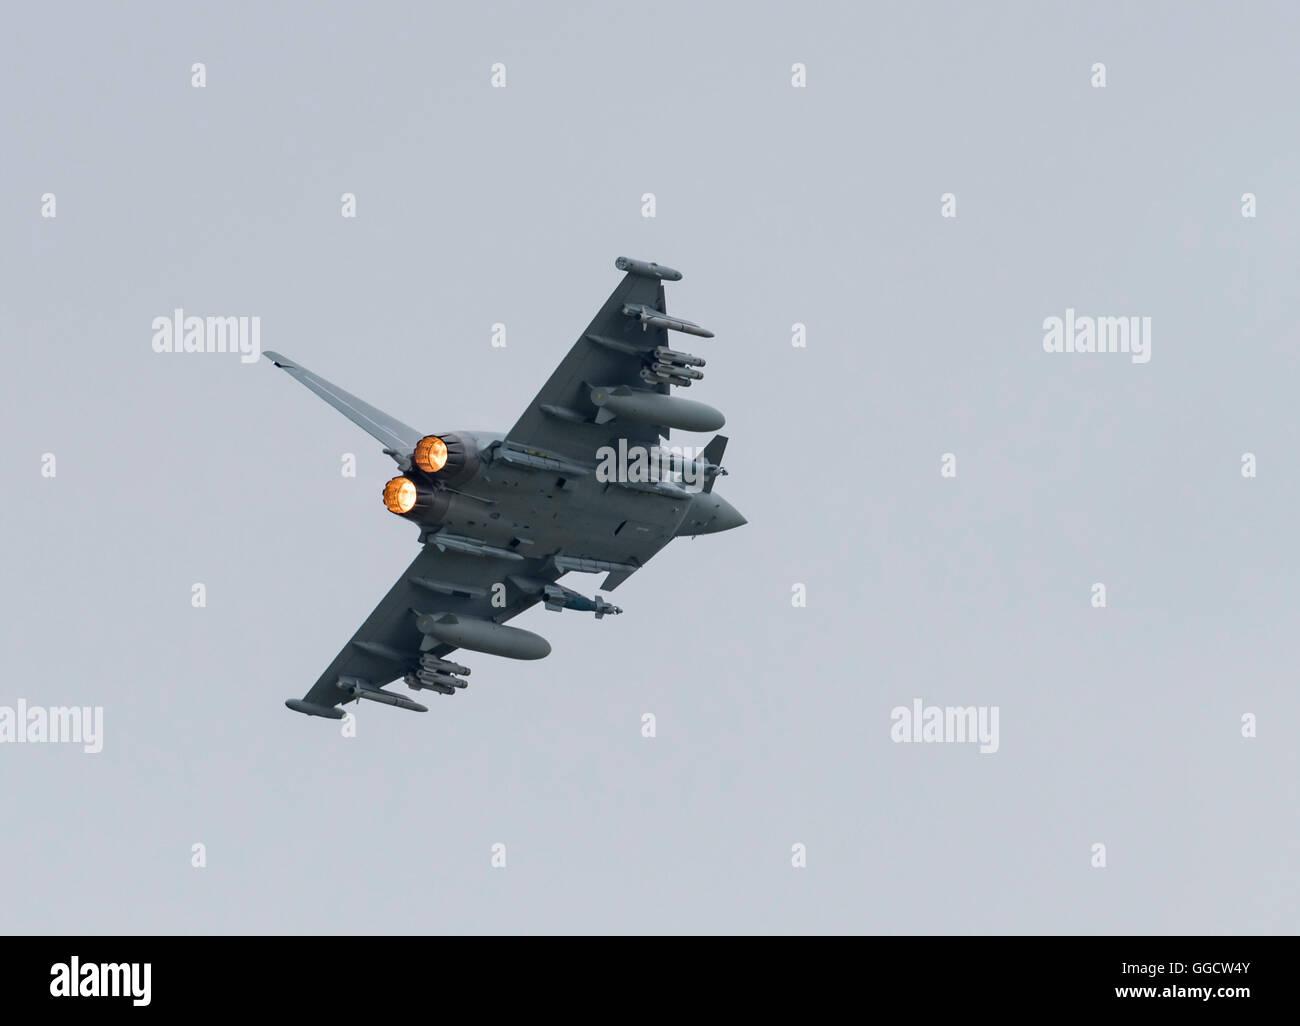 Eurofighter Typhoon BAE Systems Warton at the Royal International air Tattoo 2016 - Stock Image